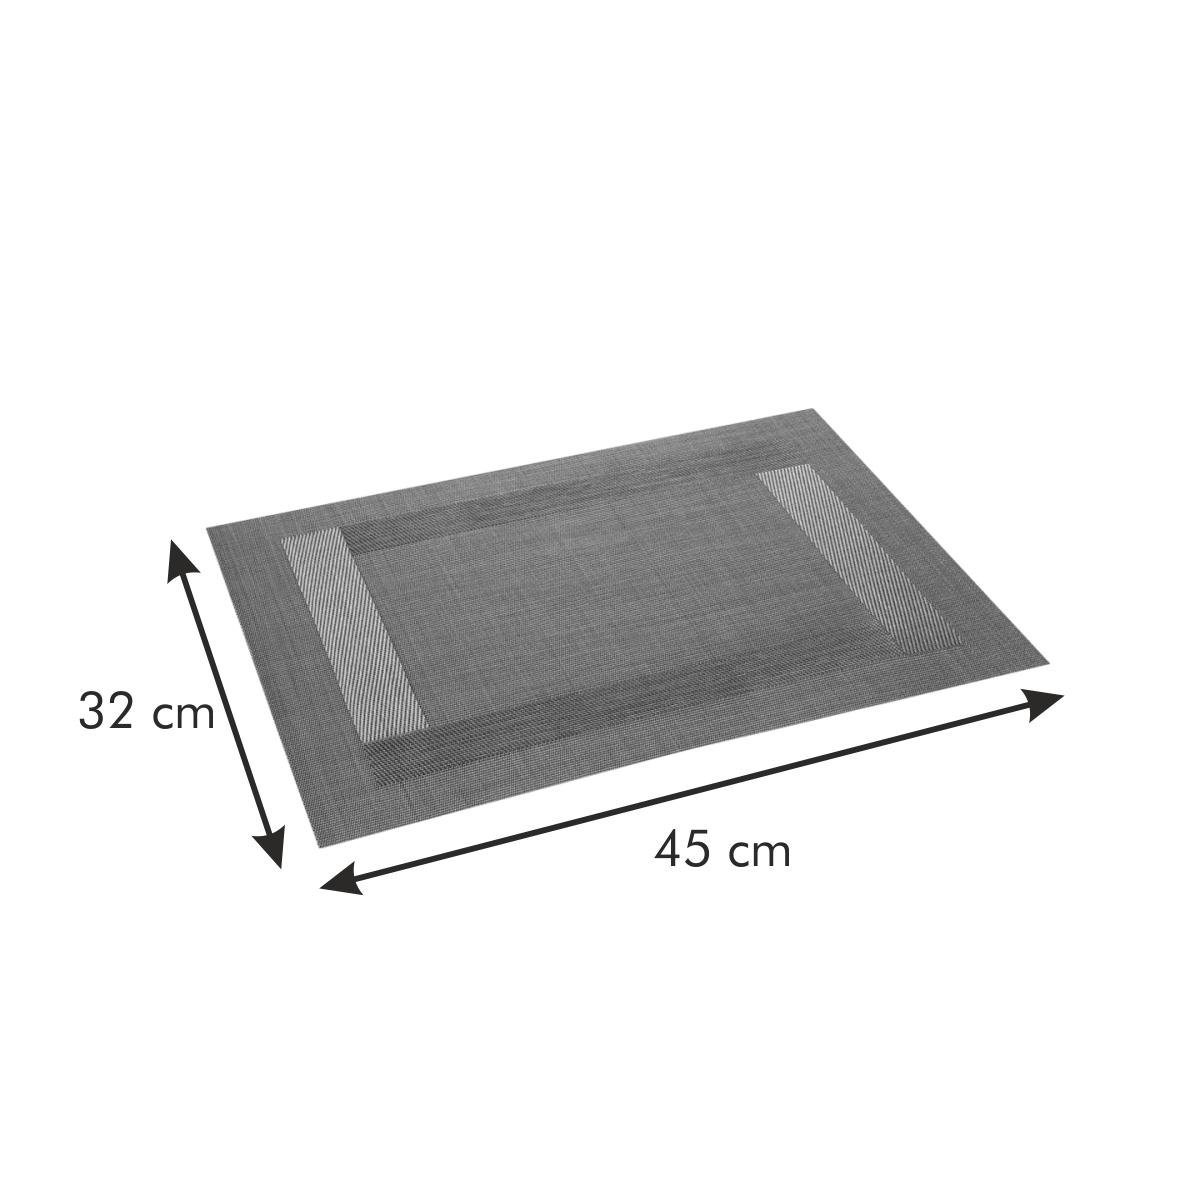 Prostírání FLAIR FRAME 45x32 cm, hnědá